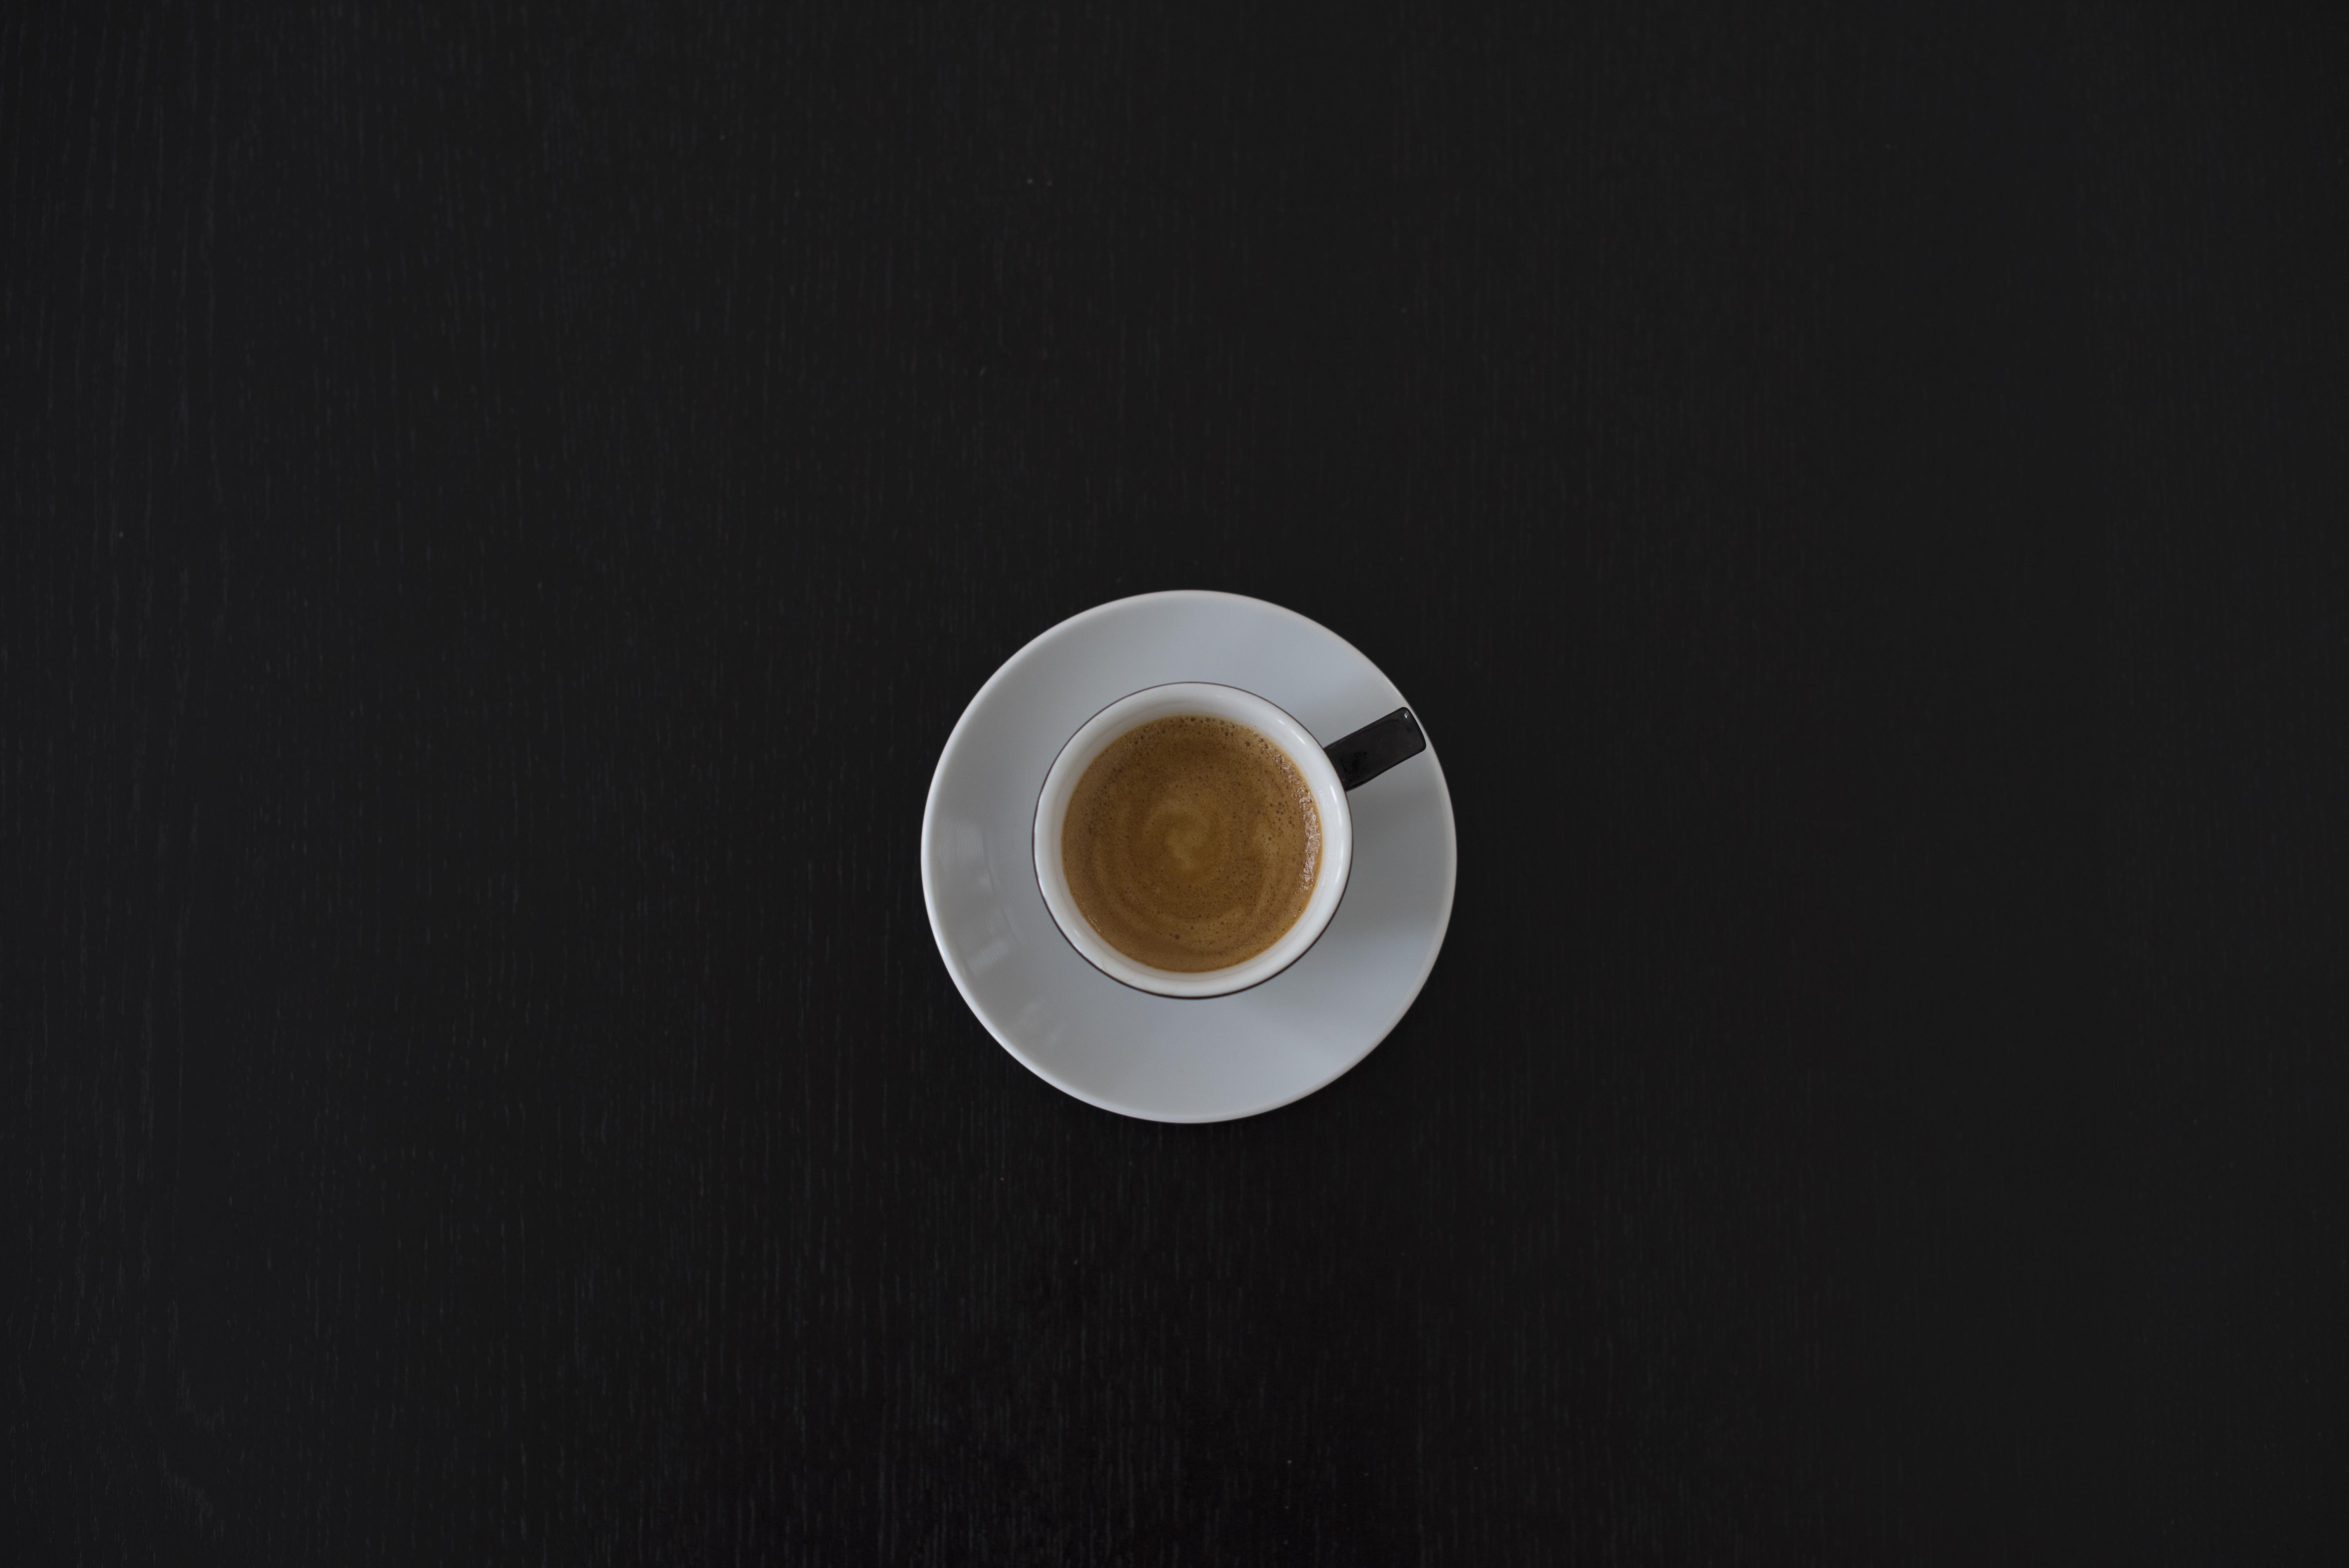 White Ceramic Coffee Cup On White Saucer 183 Free Stock Photo